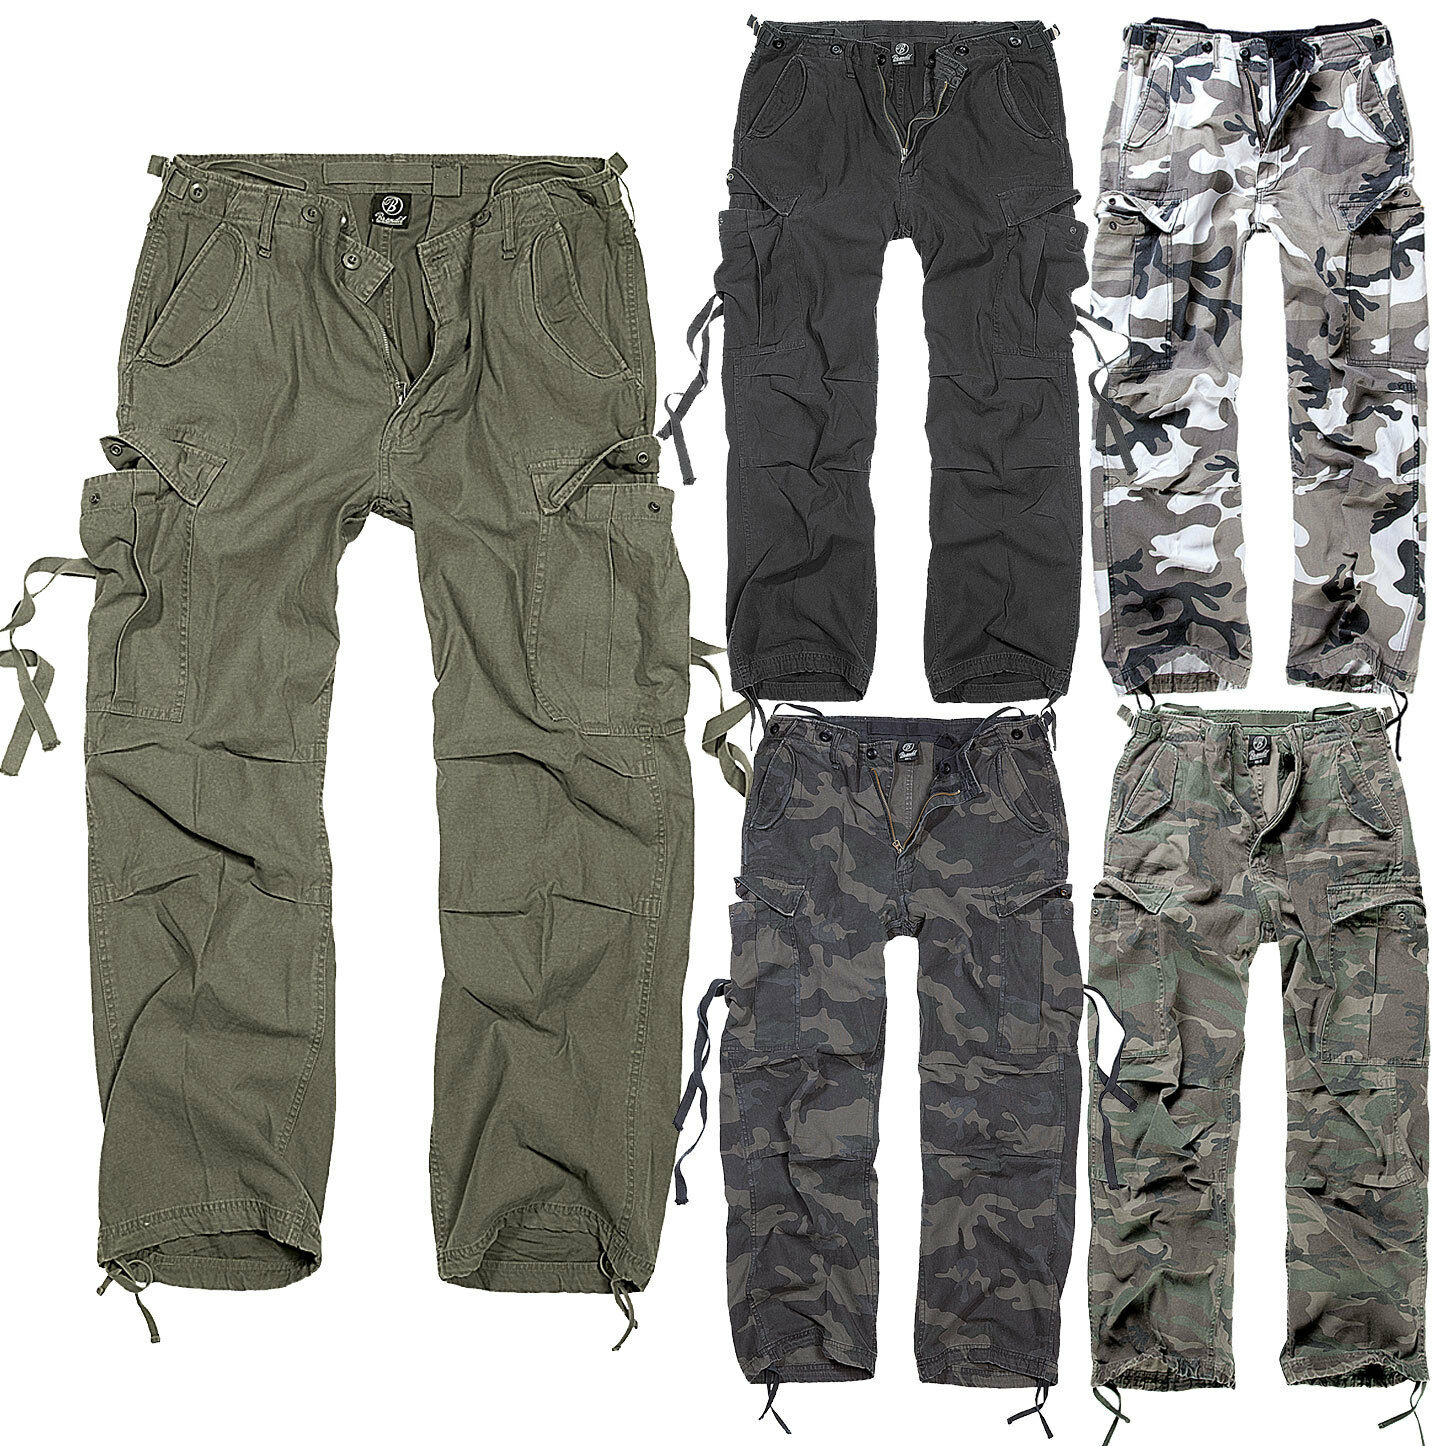 BRANDIT M65 CARGO TROUSER Vintage Hose viele Farben, S-XXL, Army Pants Cargohose